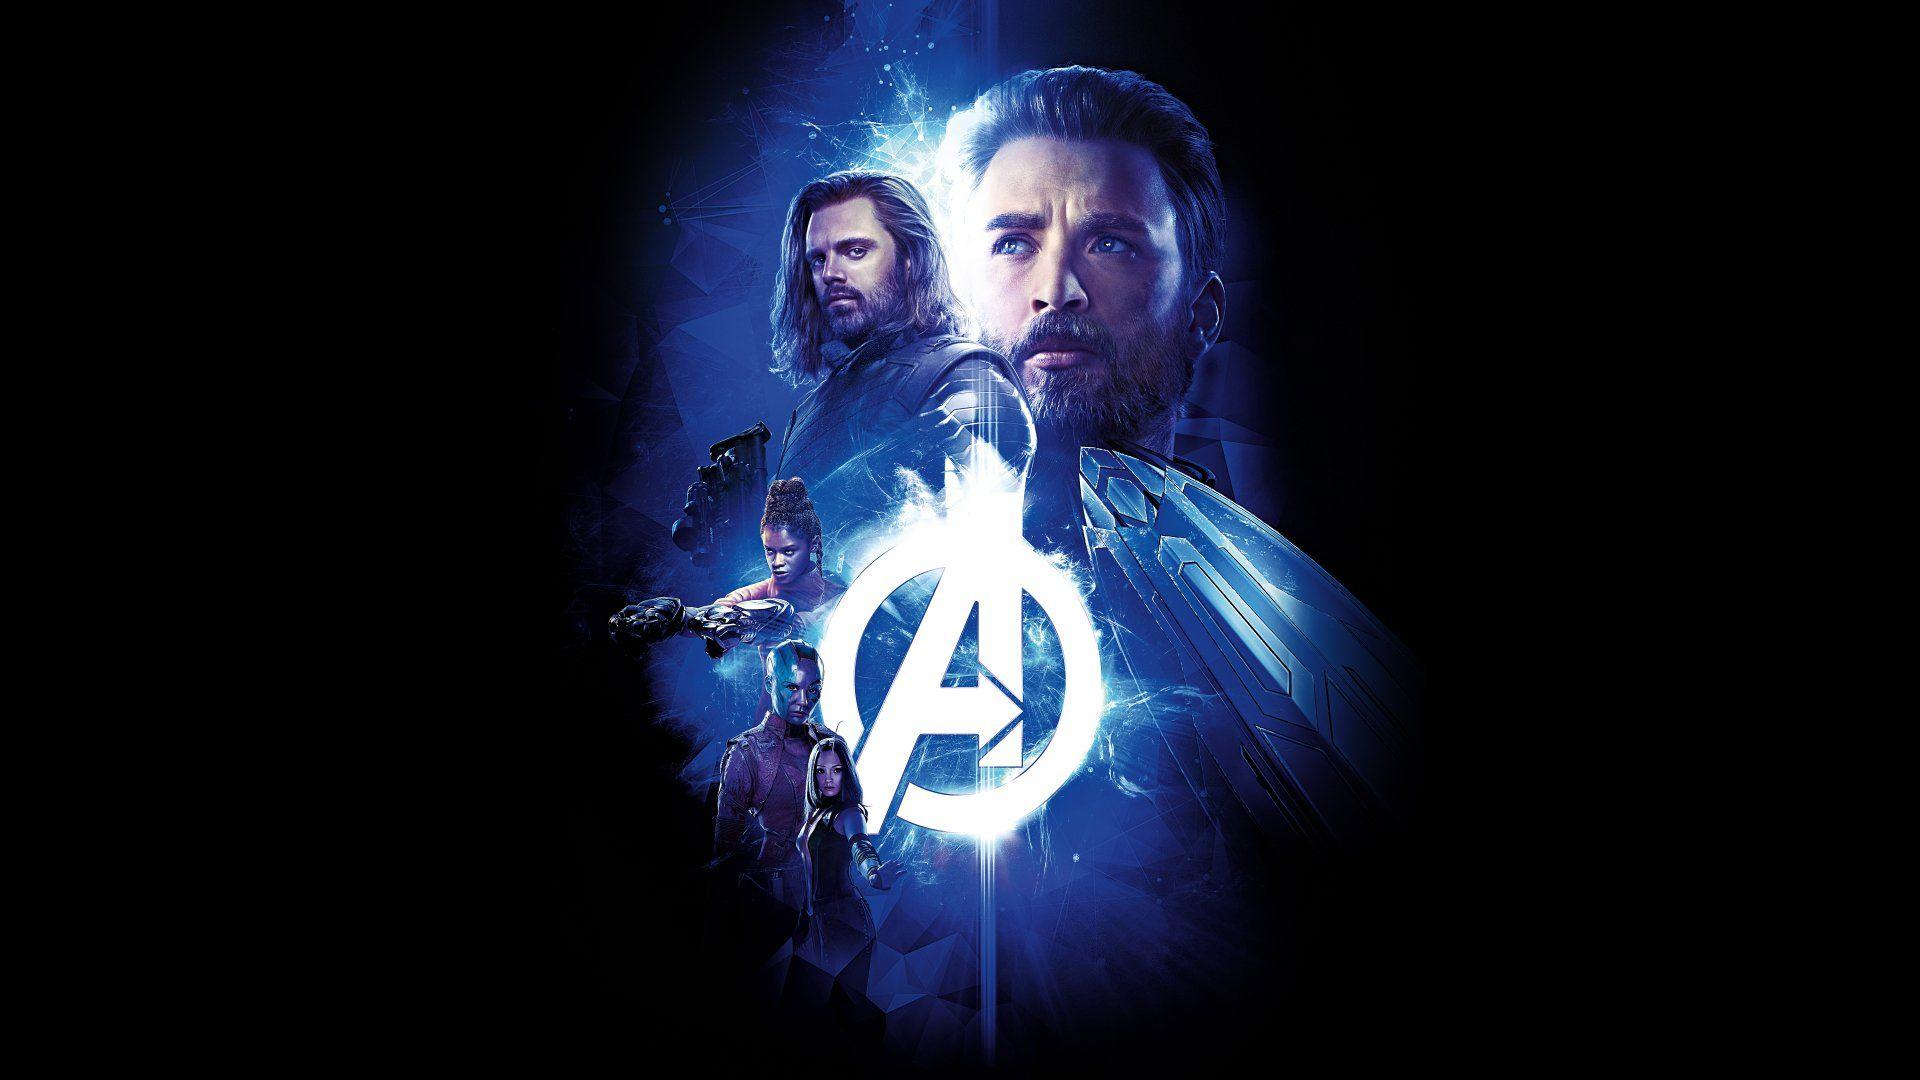 Avengers Infinity War 8k Ultra Hd Wallpaper And Background